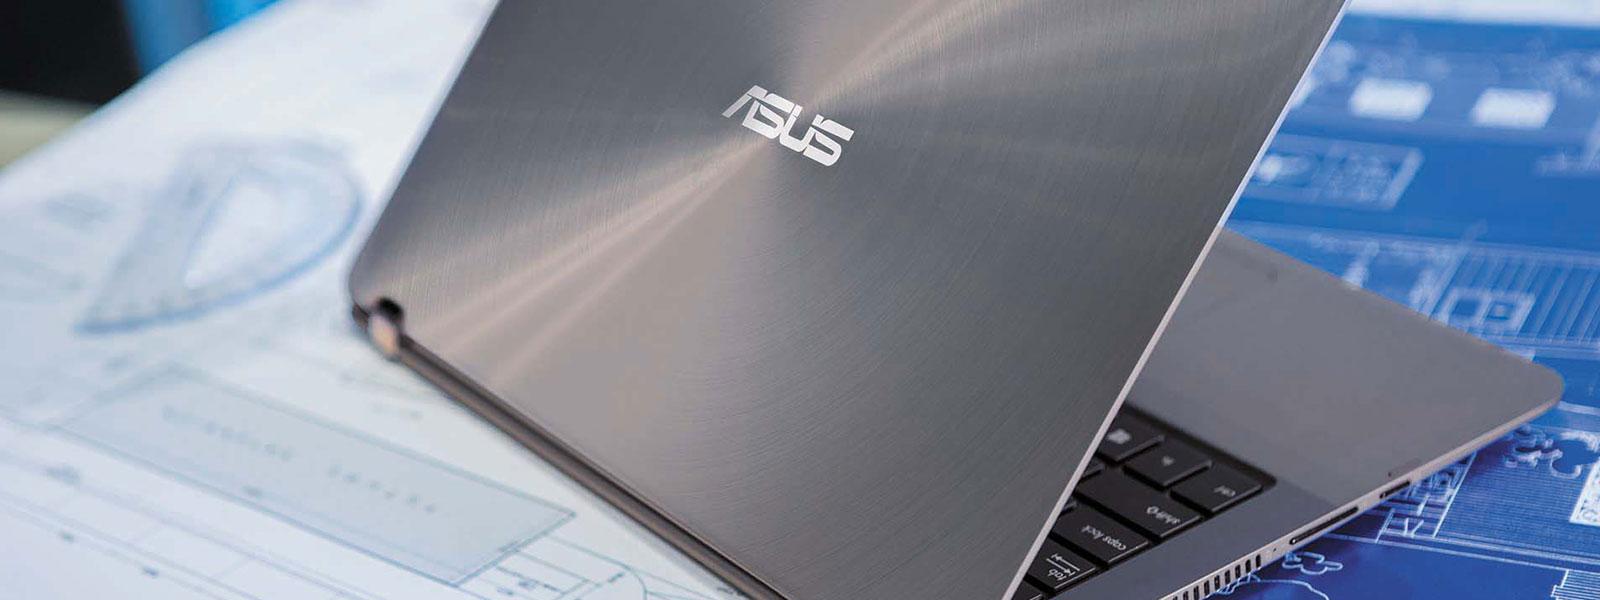 ASUS Q Series Q324 on a desk